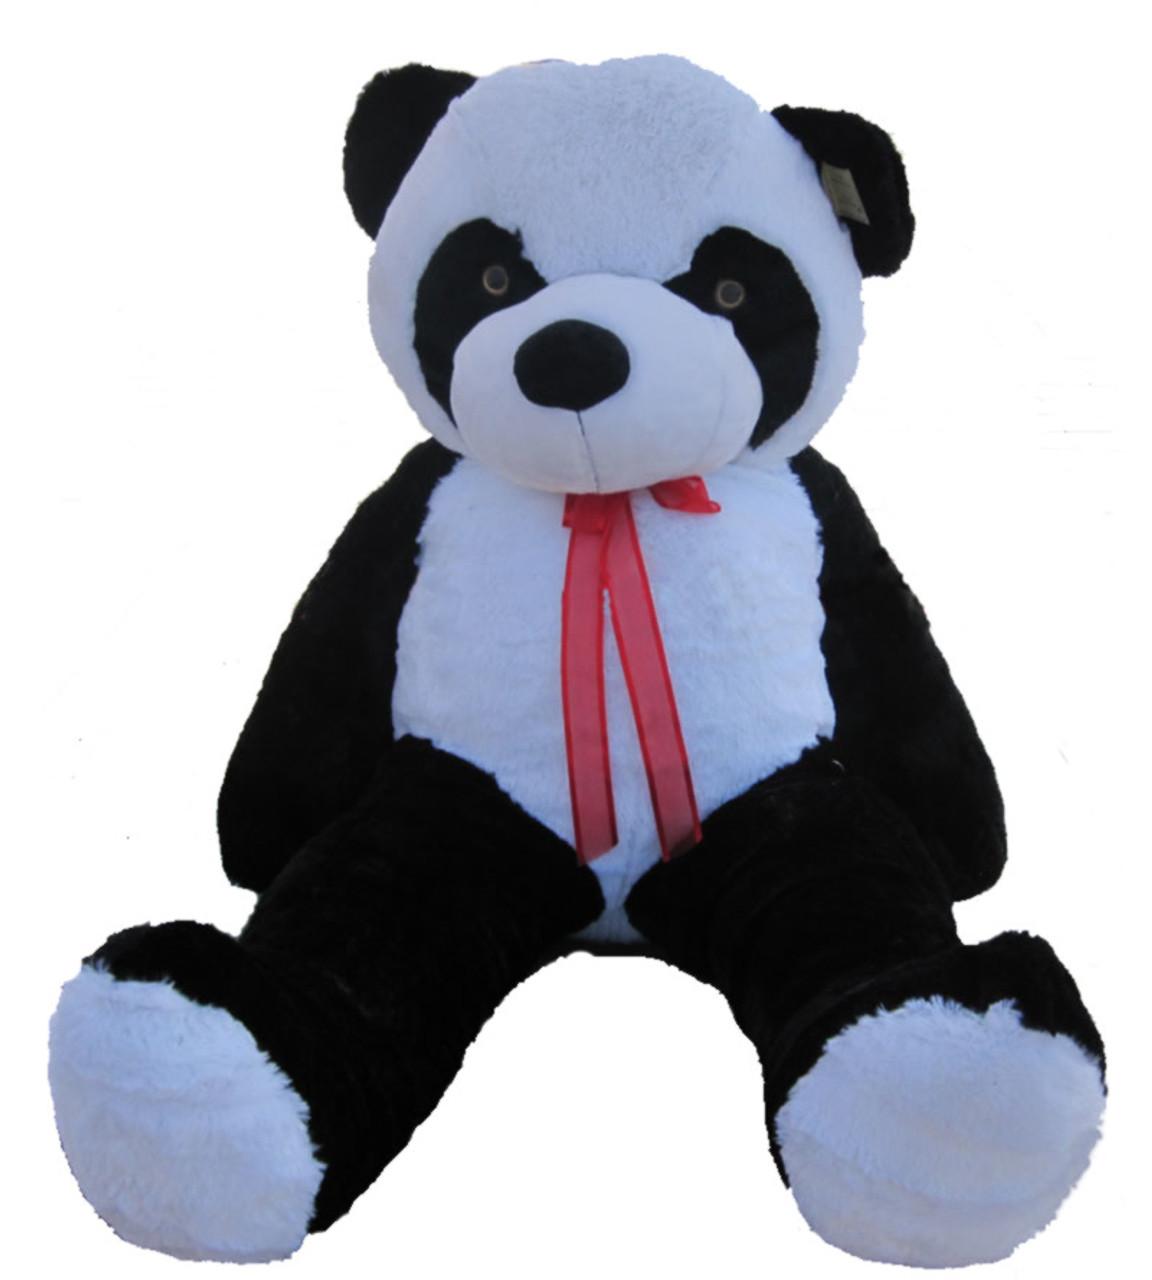 47/'/' Giant Blue Plush Teddy Bear Soft Stuffed Toy Animal Doll Valentine Gift Hot